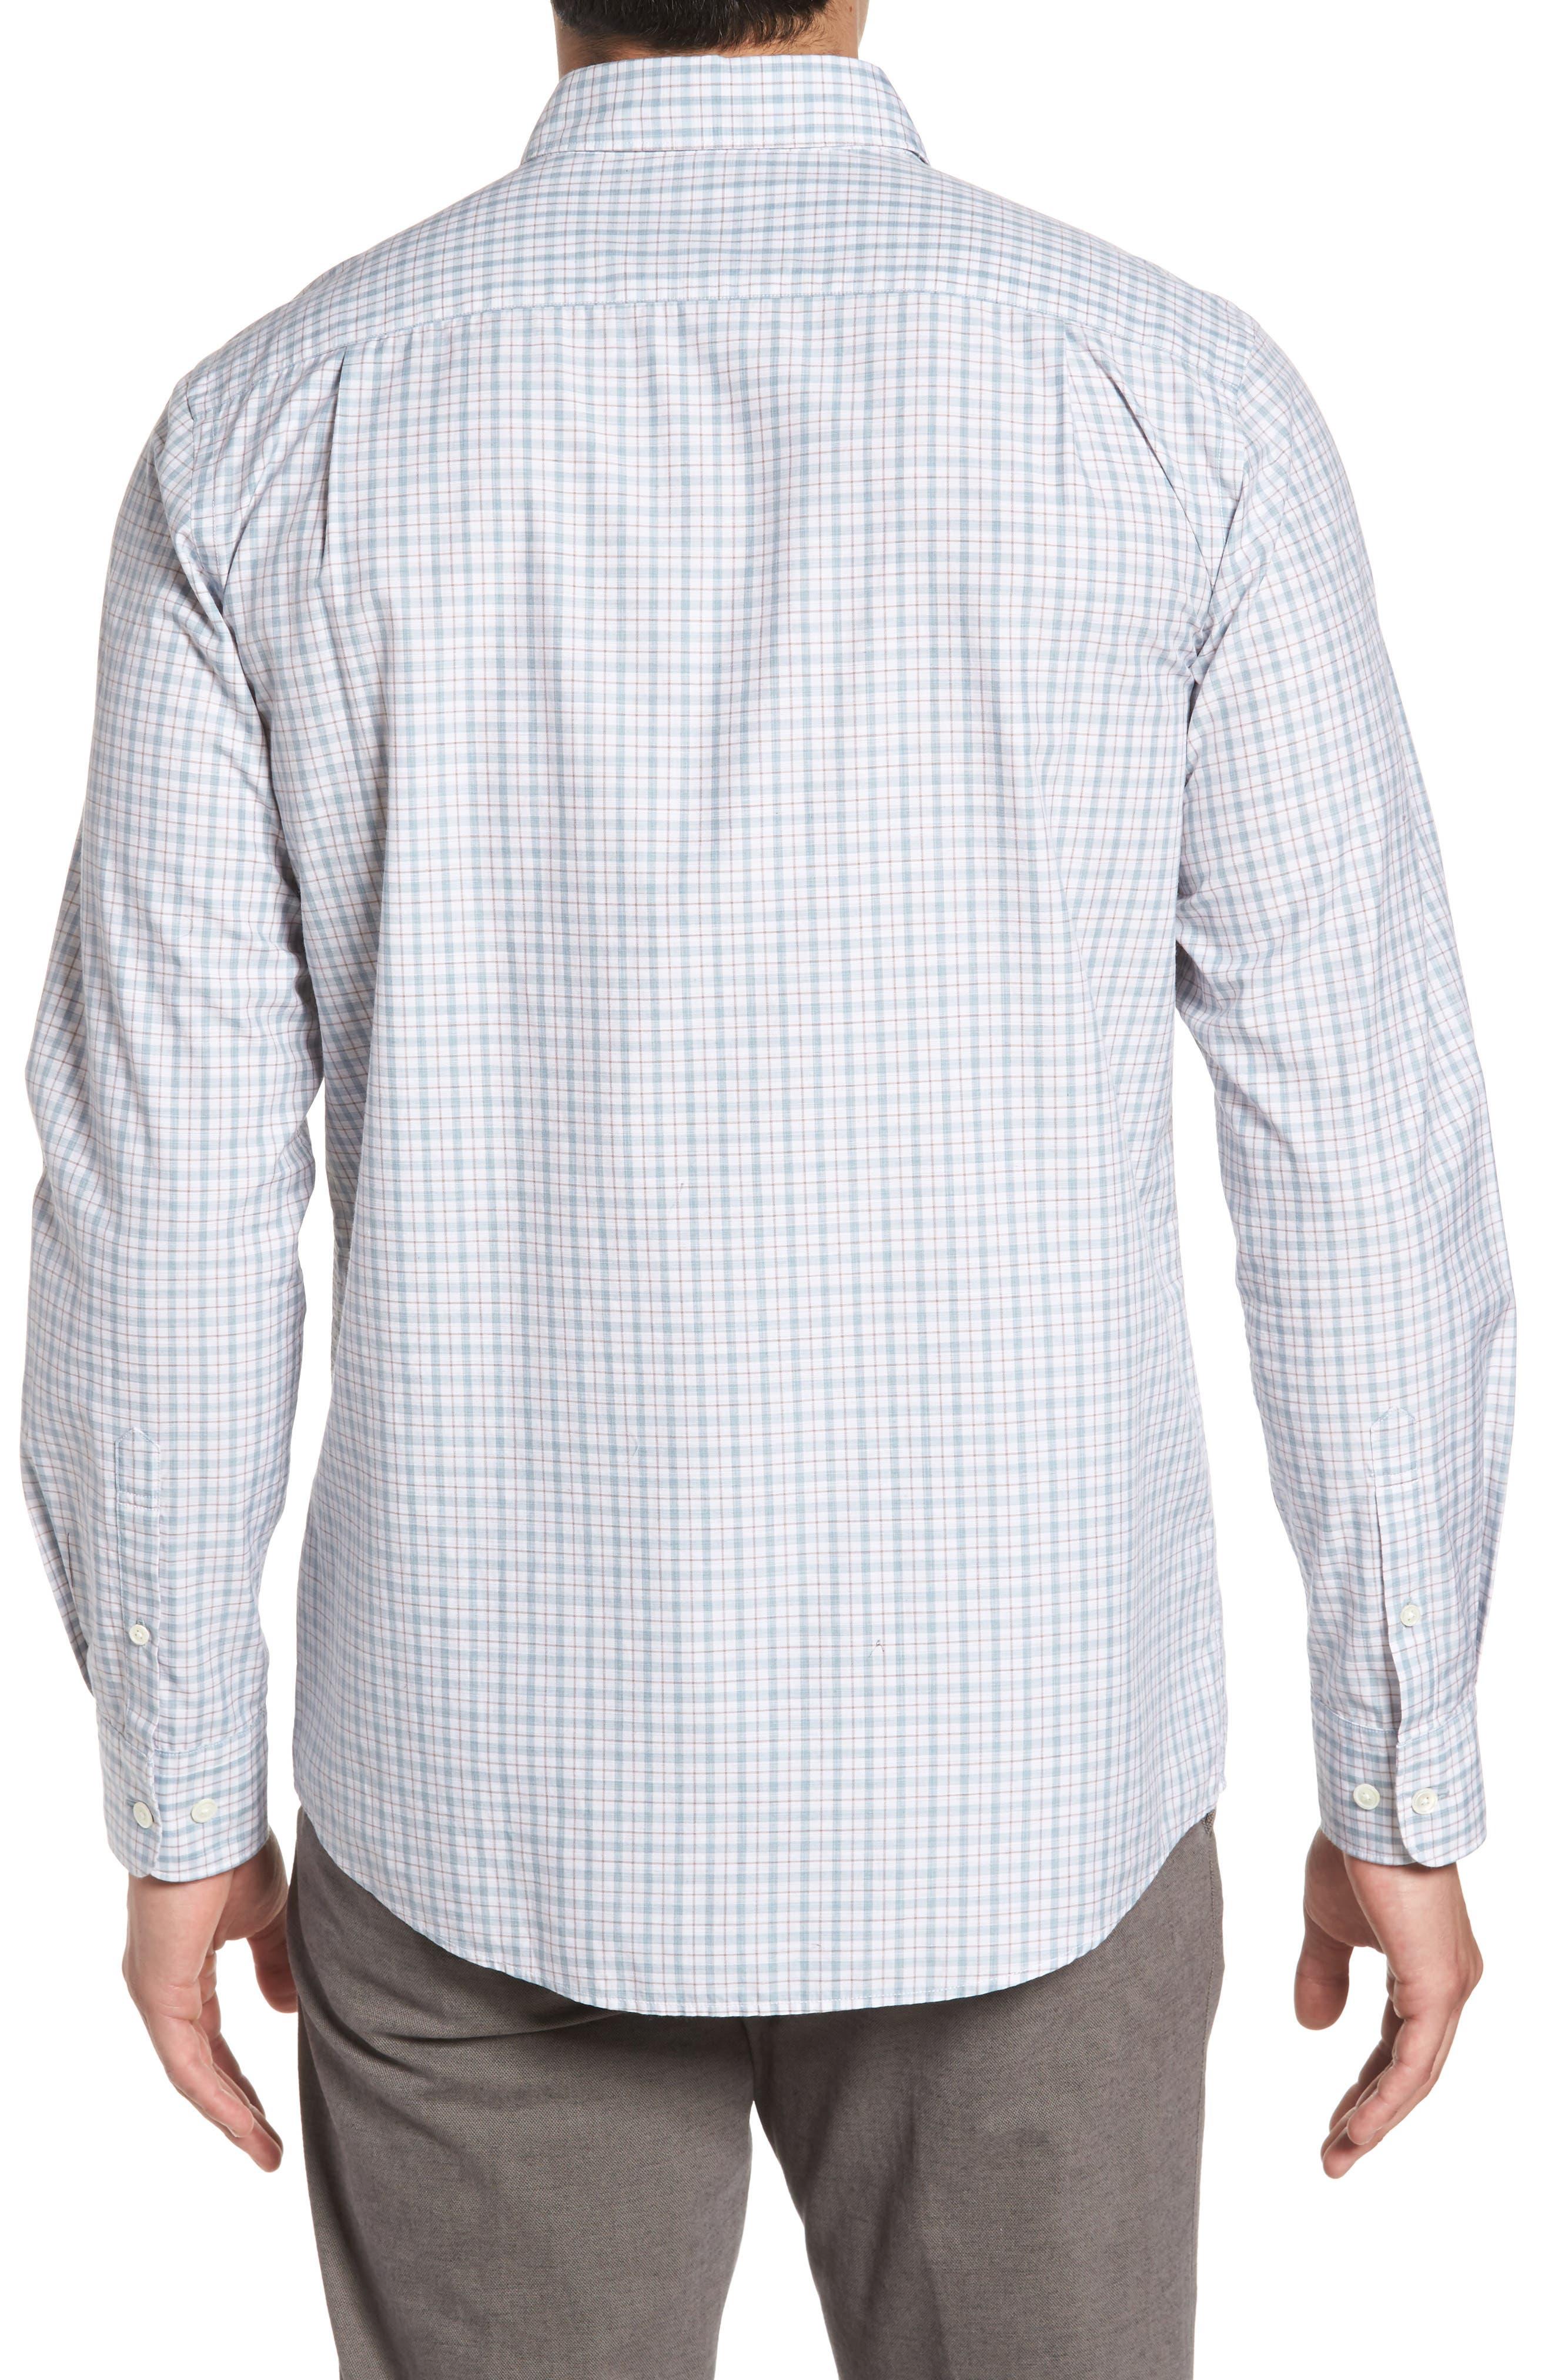 Alternate Image 2  - Rodd & Gunn Carterton Sports Fit Plaid Sport Shirt